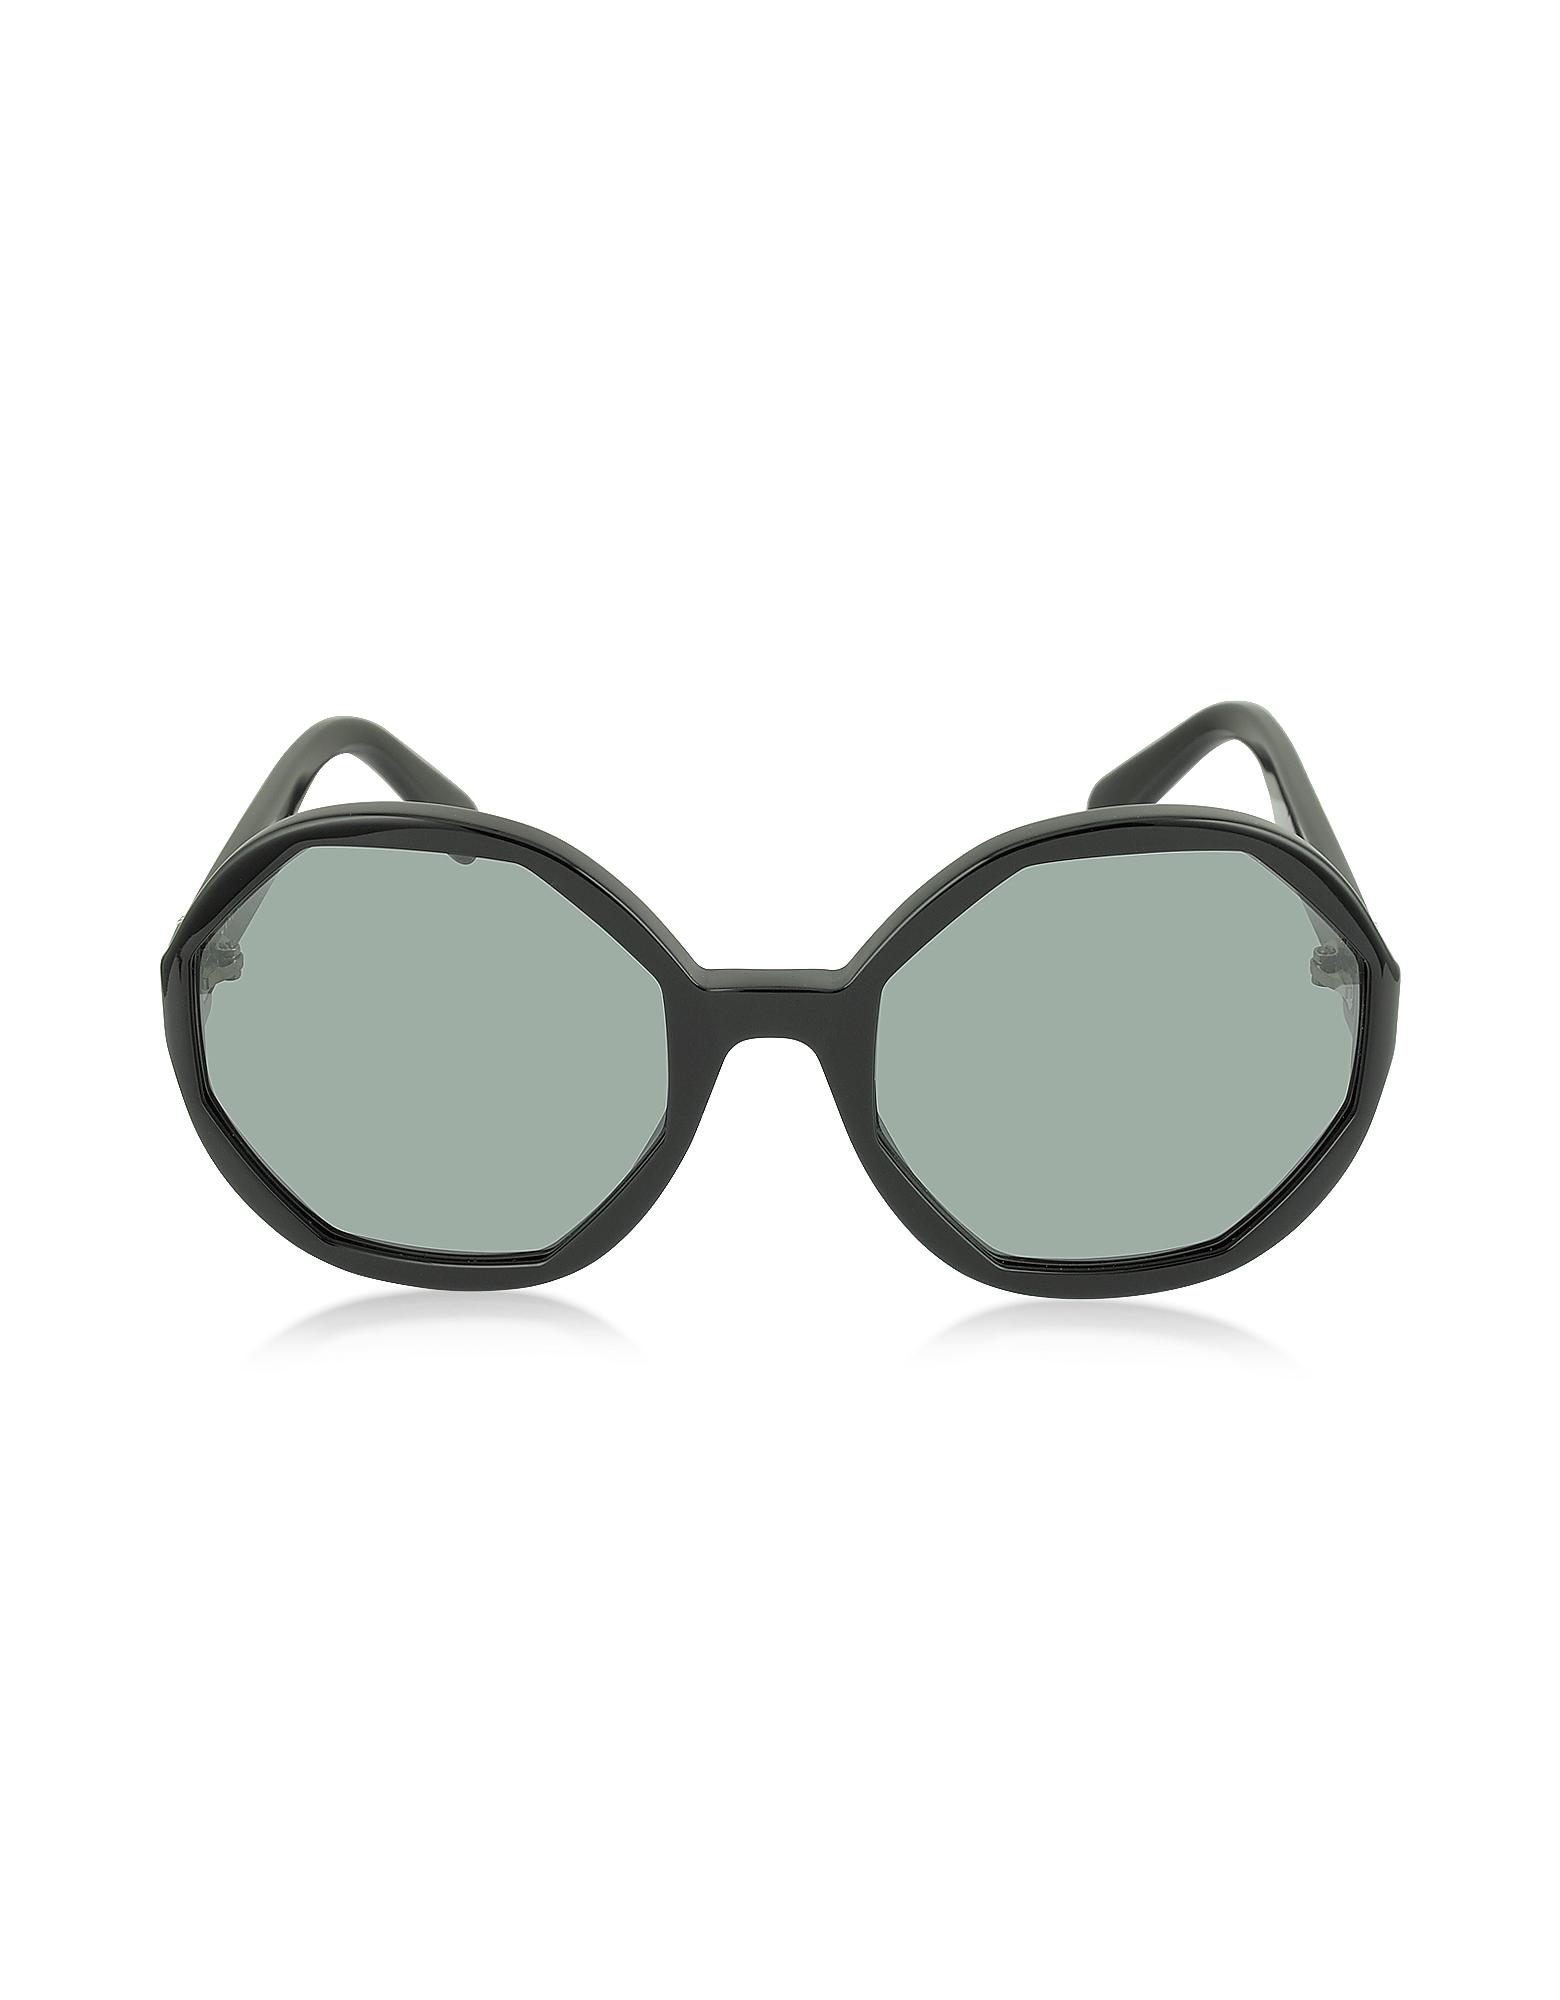 Marc Jacobs Sunglasses, MJ 584/S Honey Octagon Women's Sunglasses